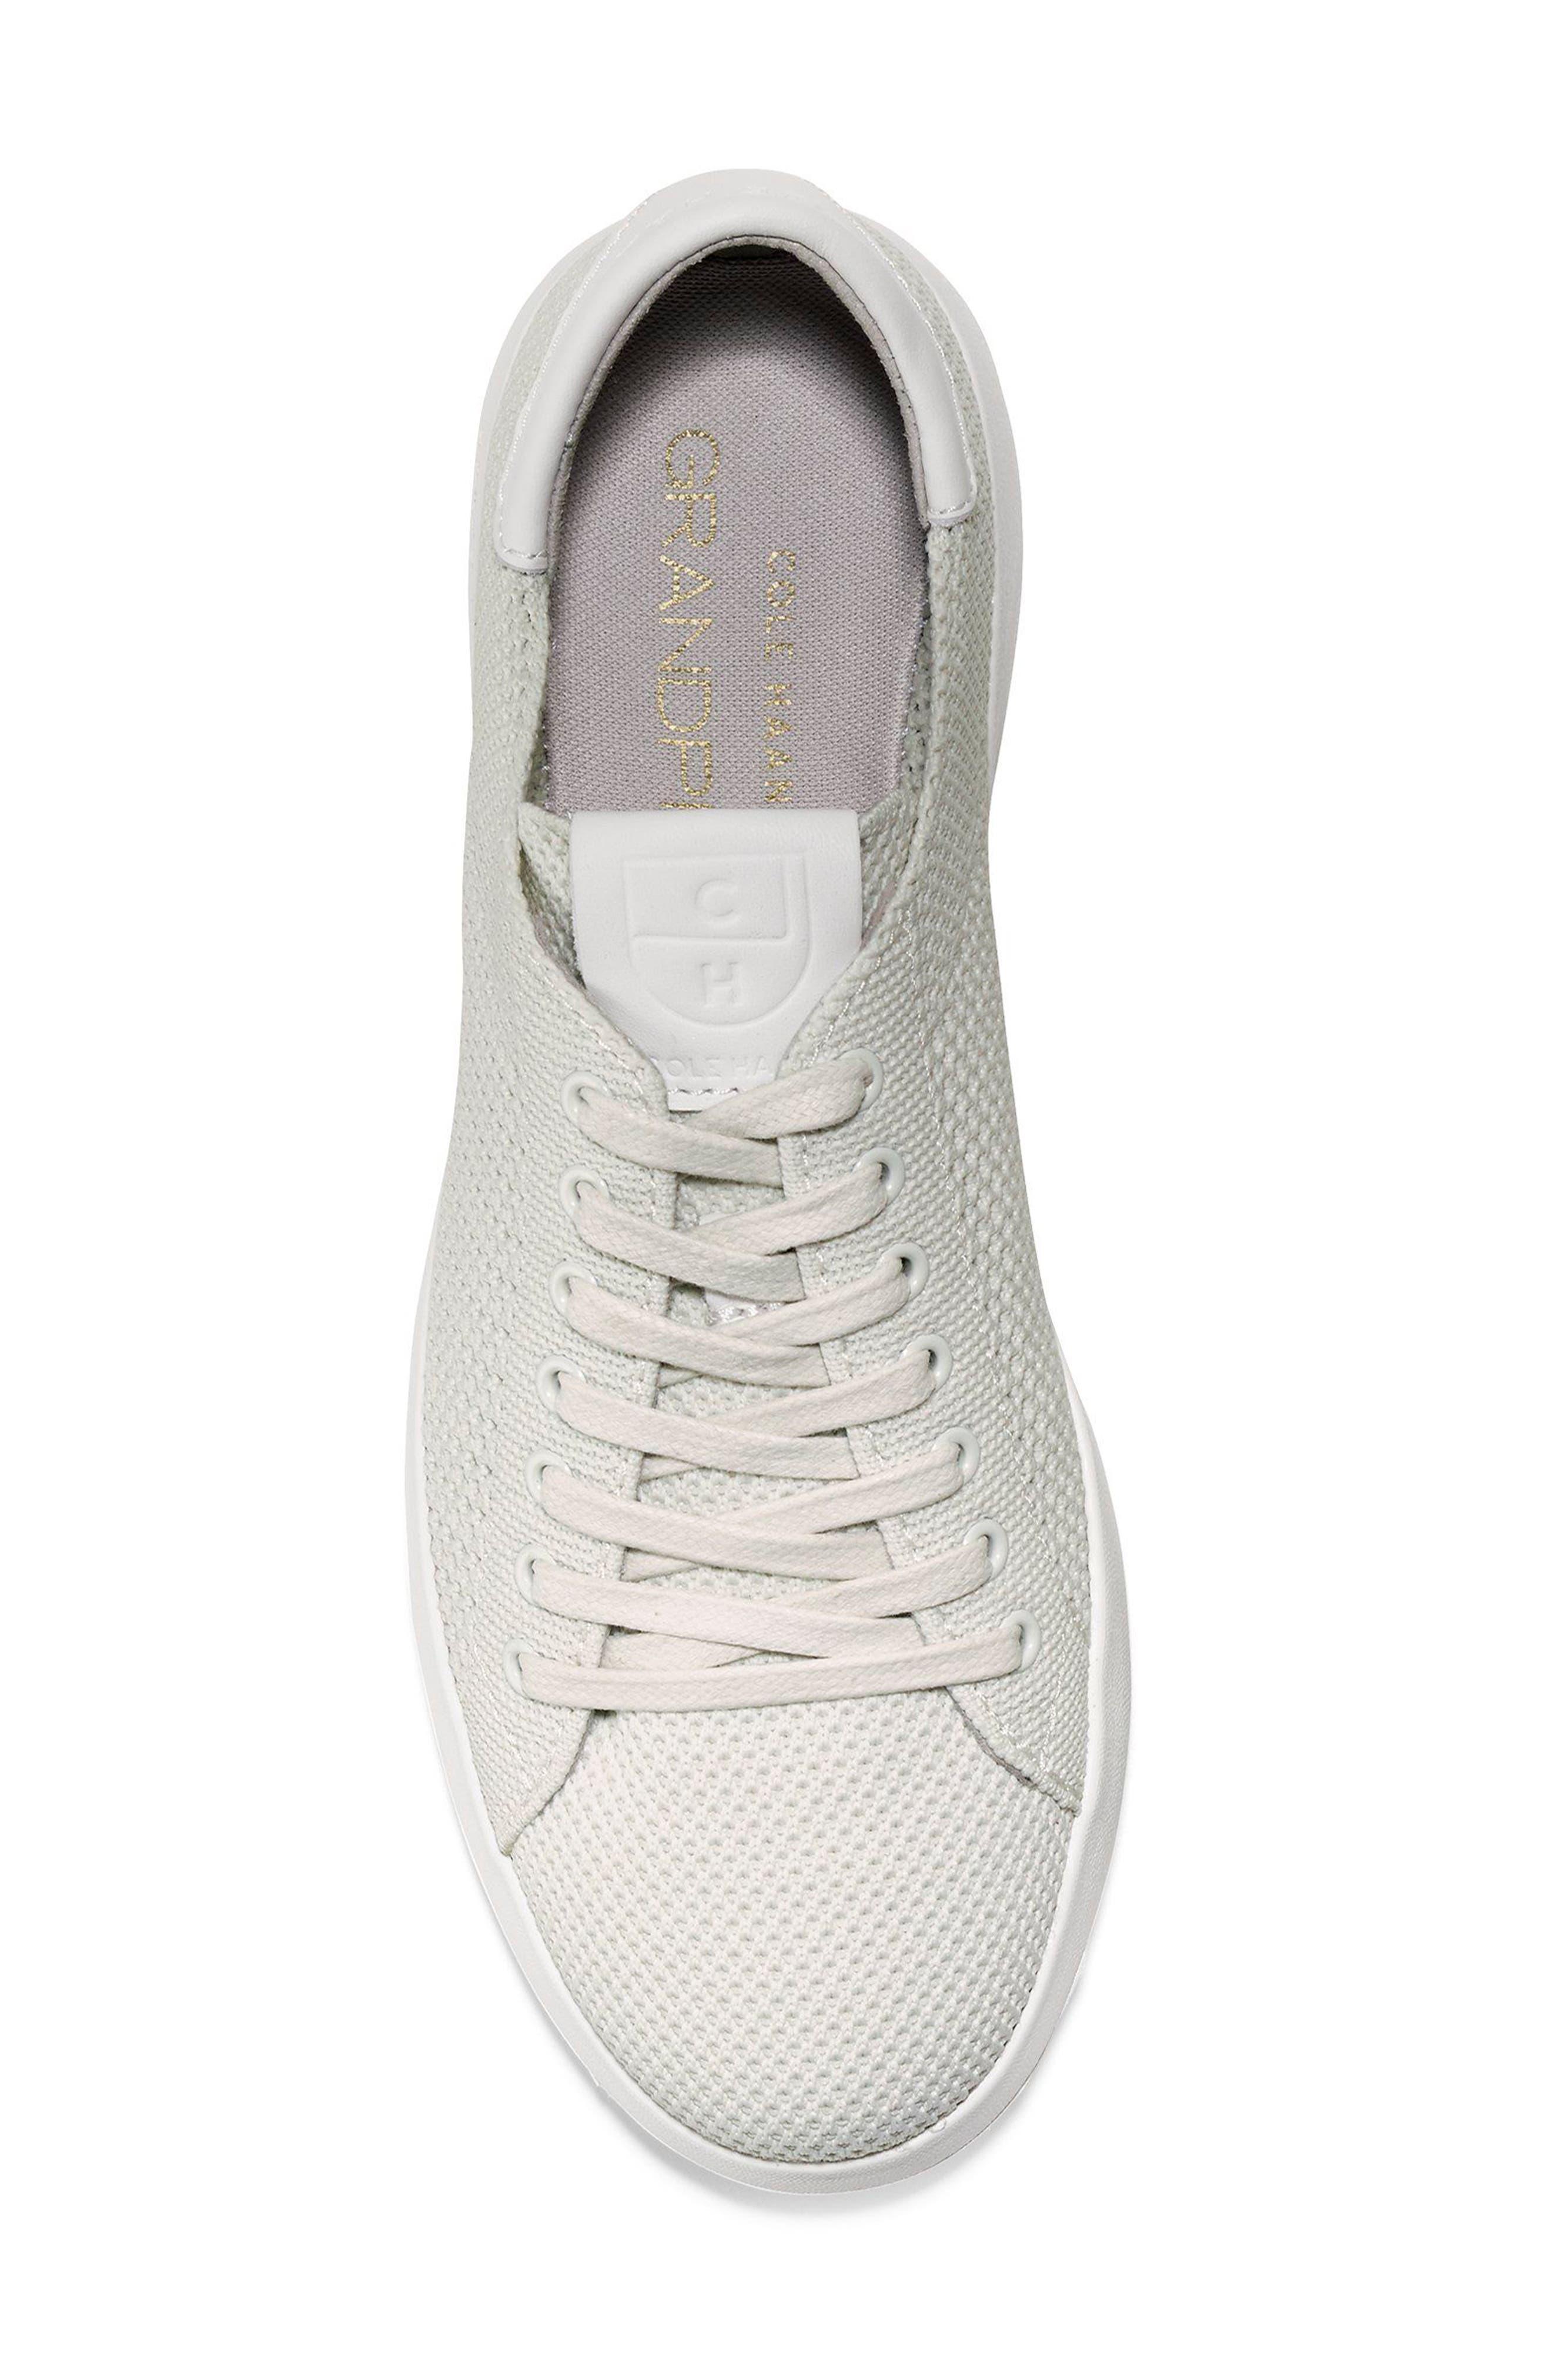 GrandPro Stitchlite Sneaker,                             Alternate thumbnail 5, color,                             CHALK FABRIC